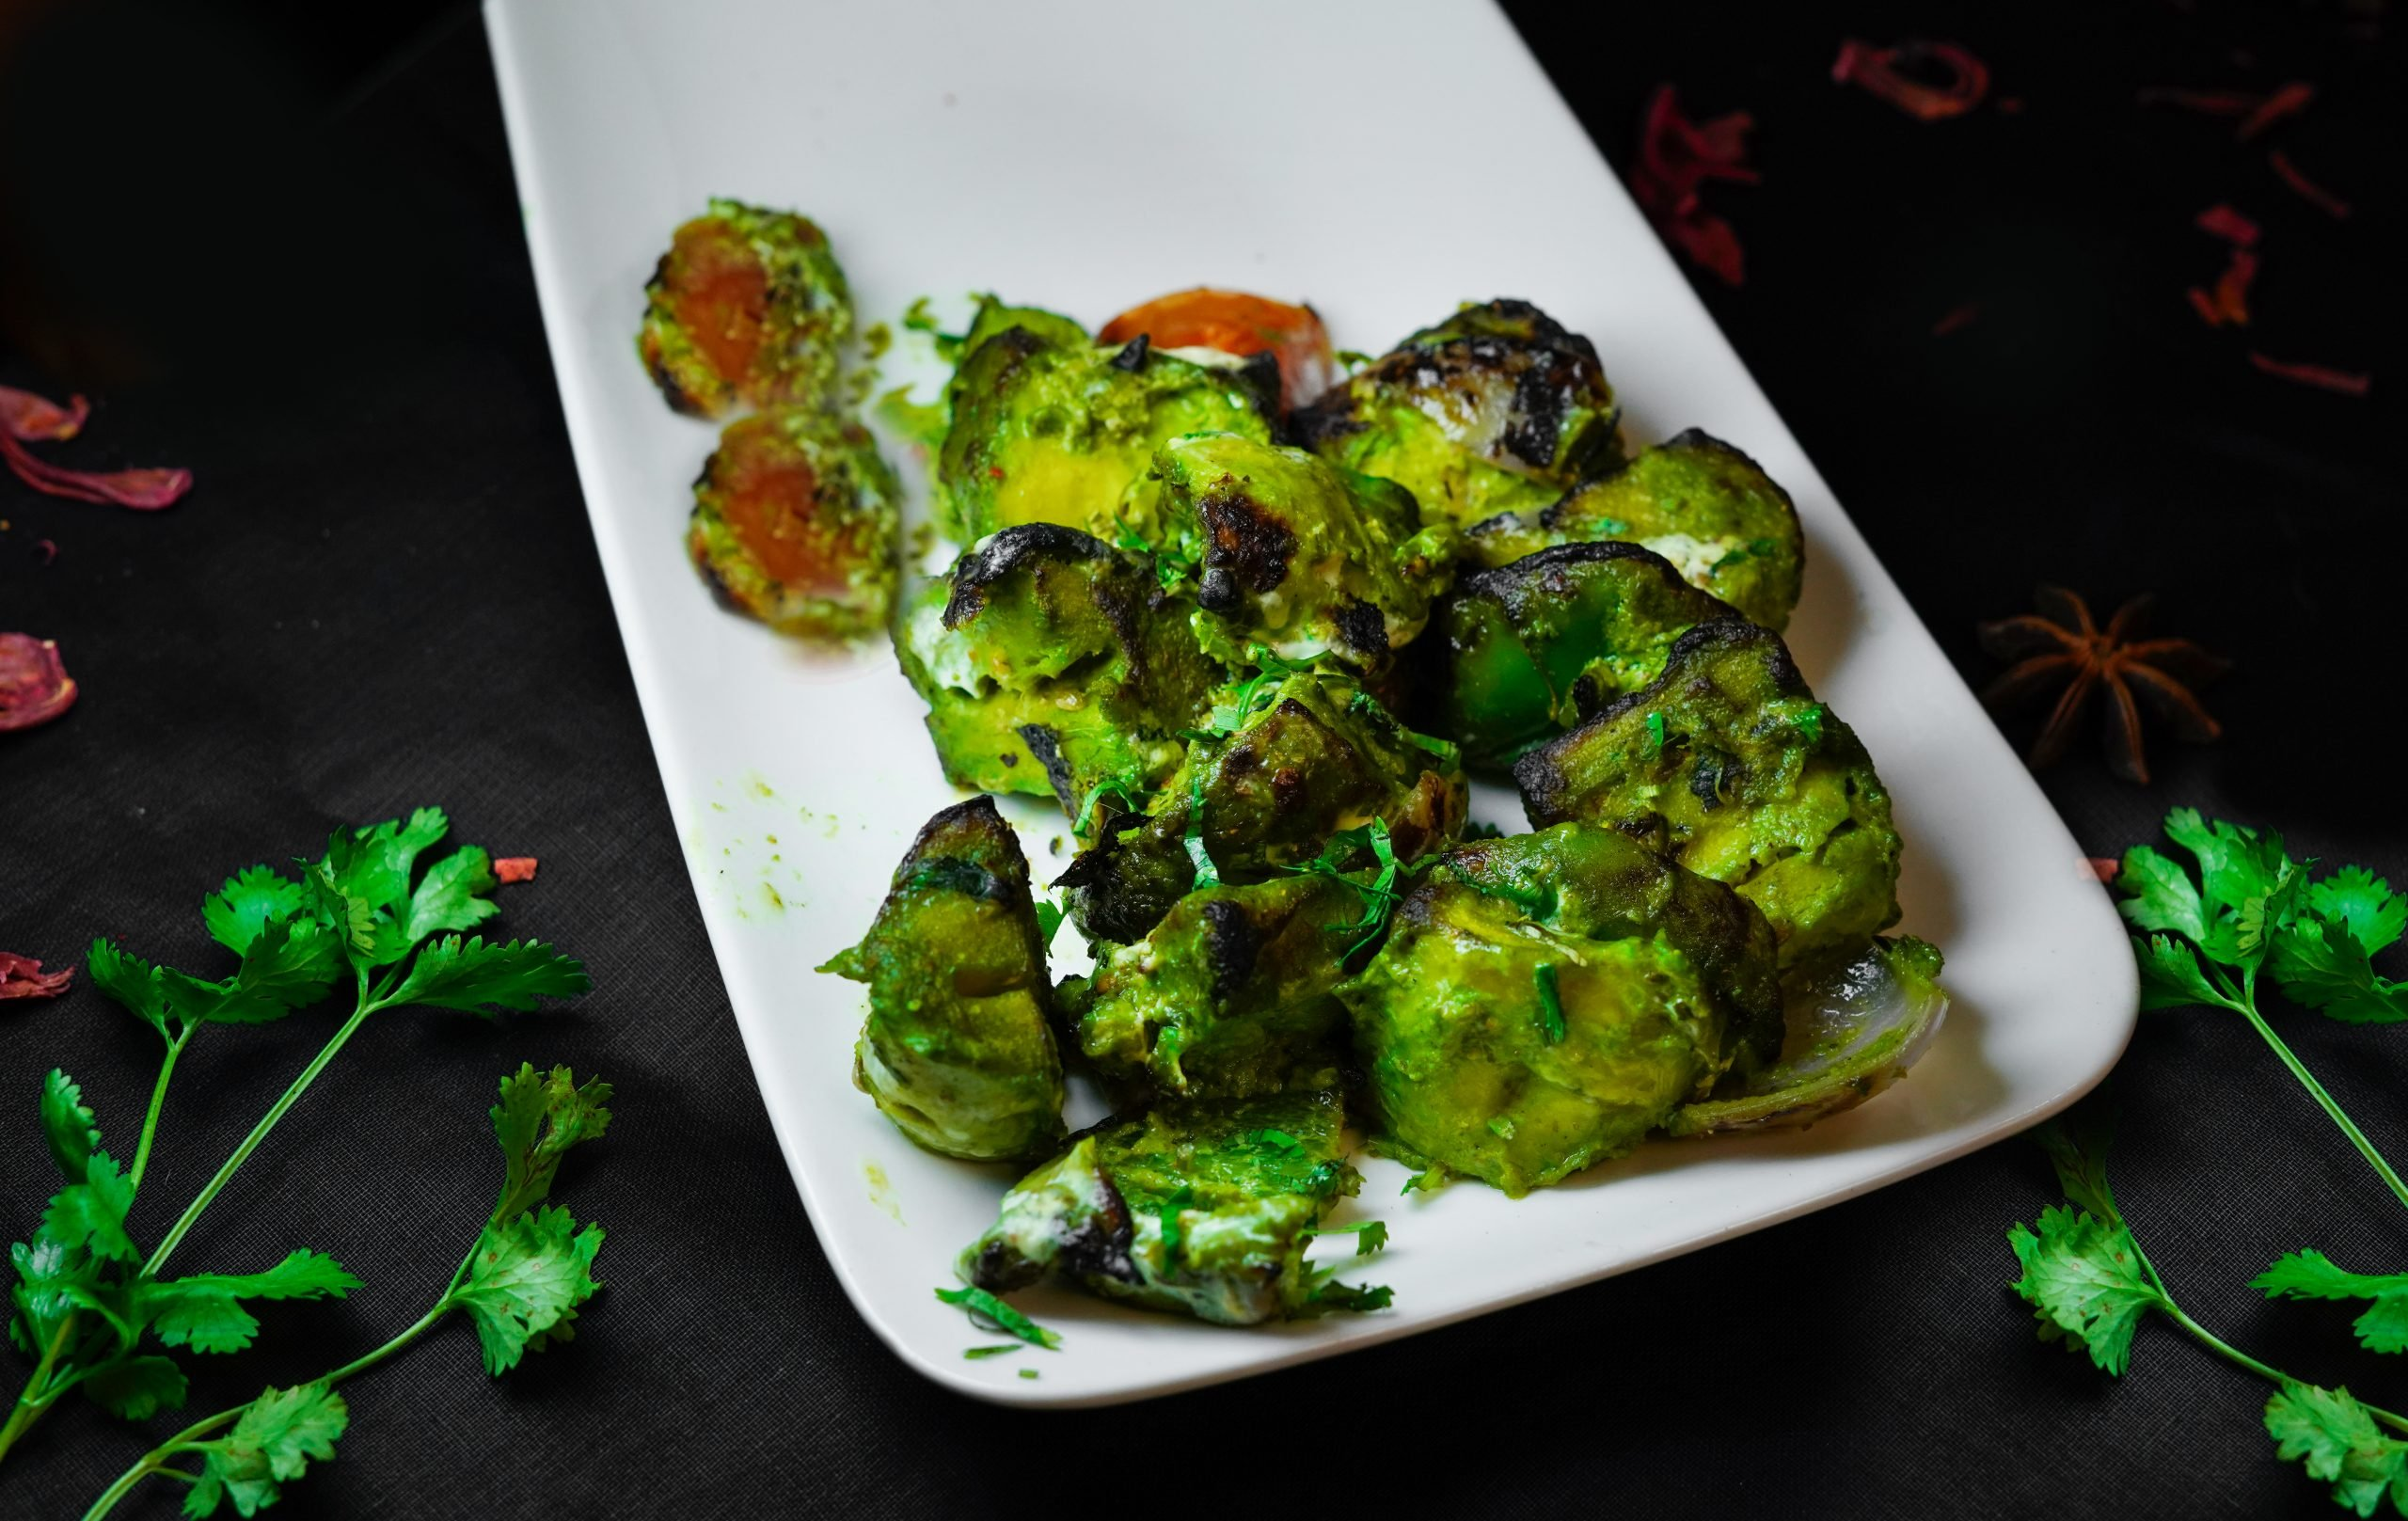 Indian Green Food